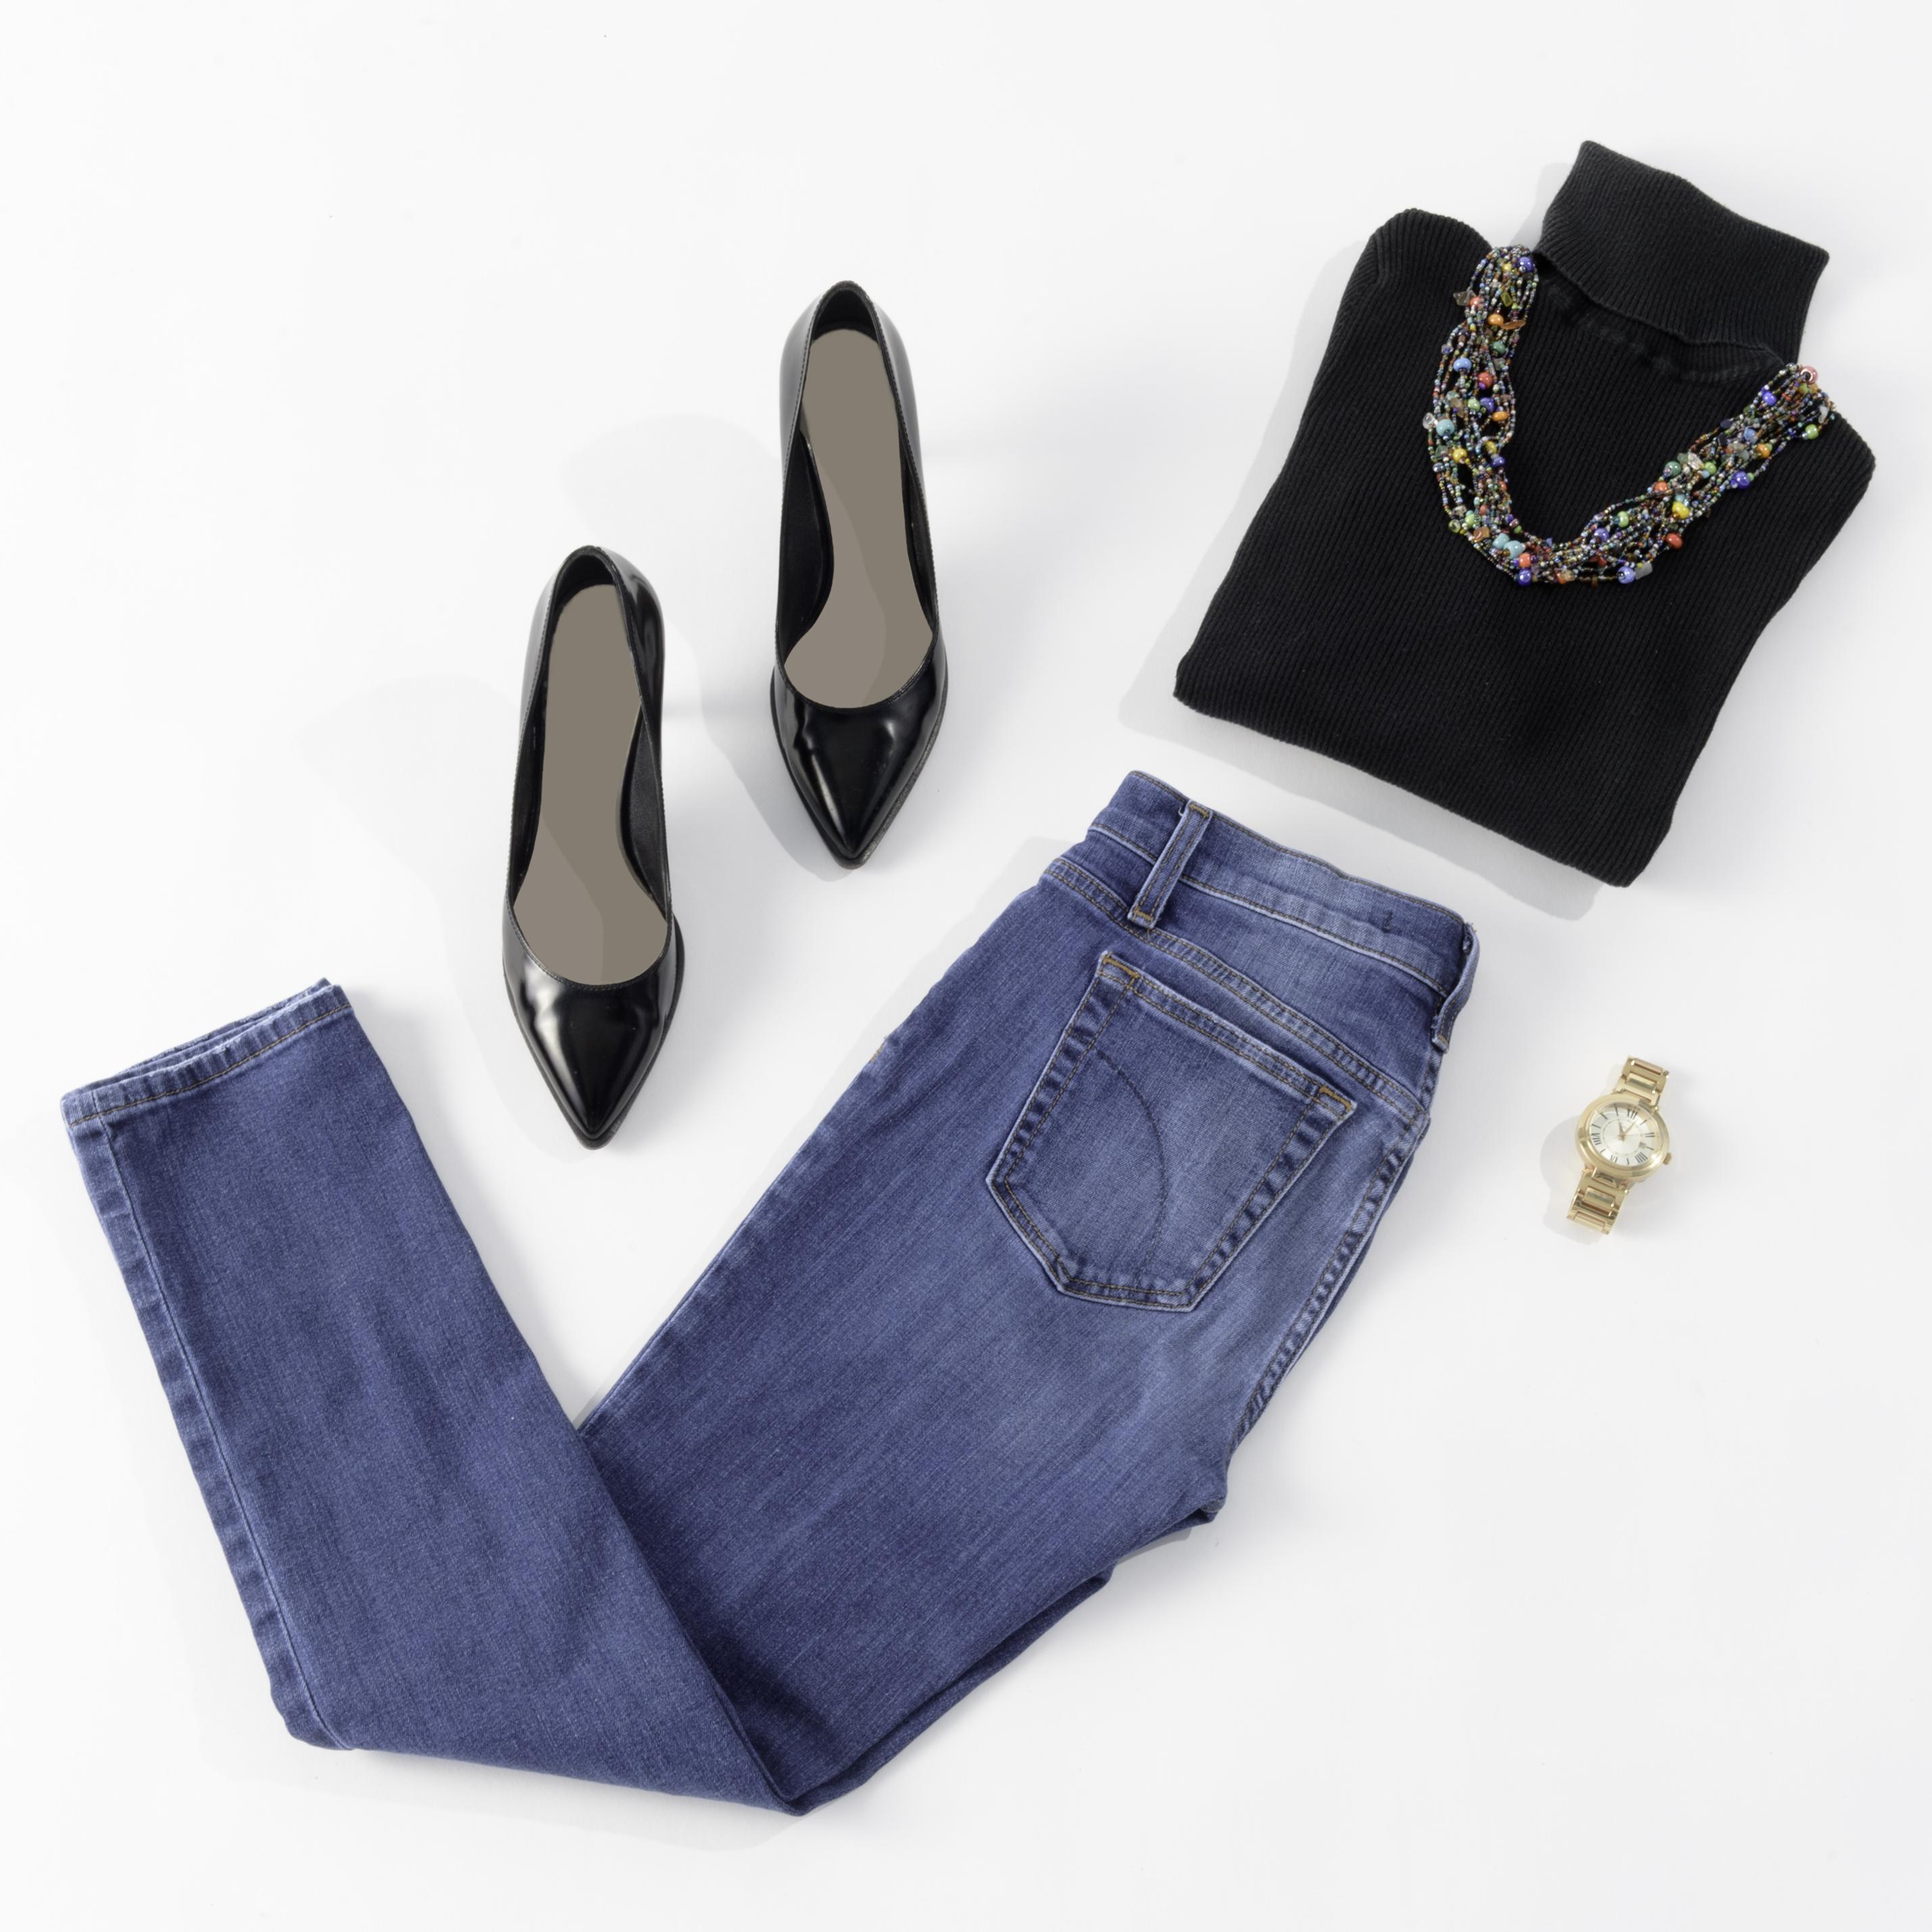 style & clothing step 4